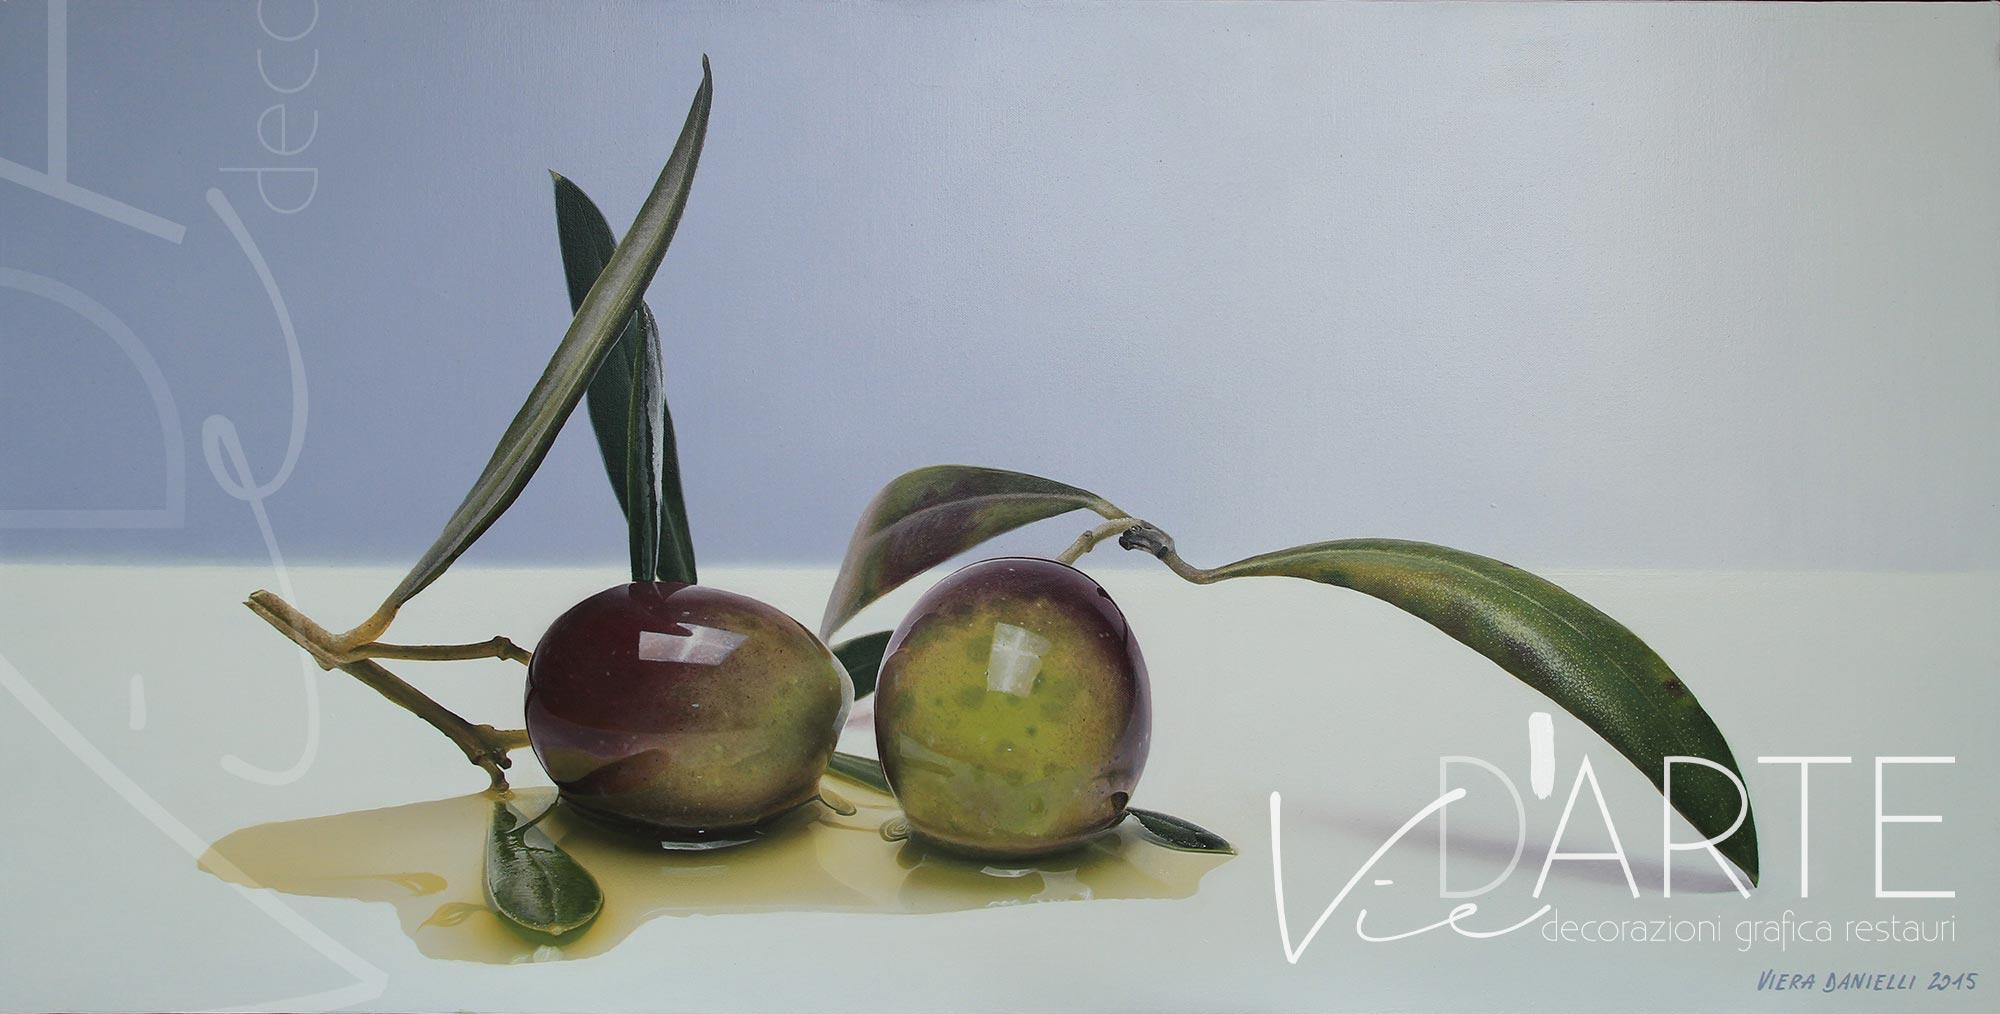 Quadro moderno, iperrealismo, olio su tela. Orvieto